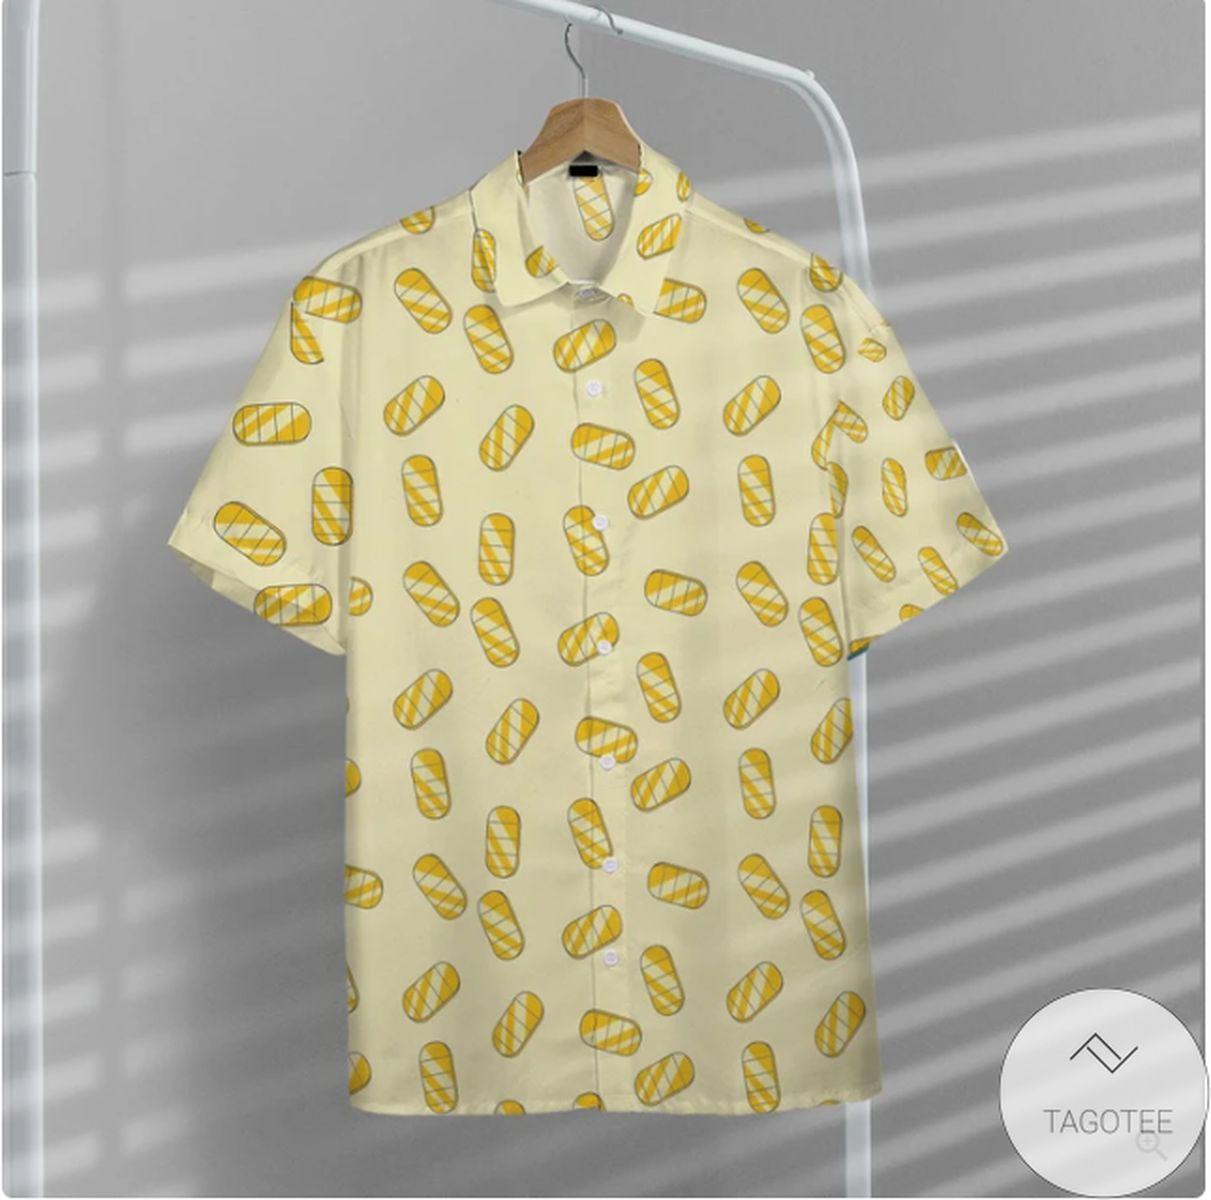 Meowth Gold Coin Pattern Pokemon Hawaiian Shirt